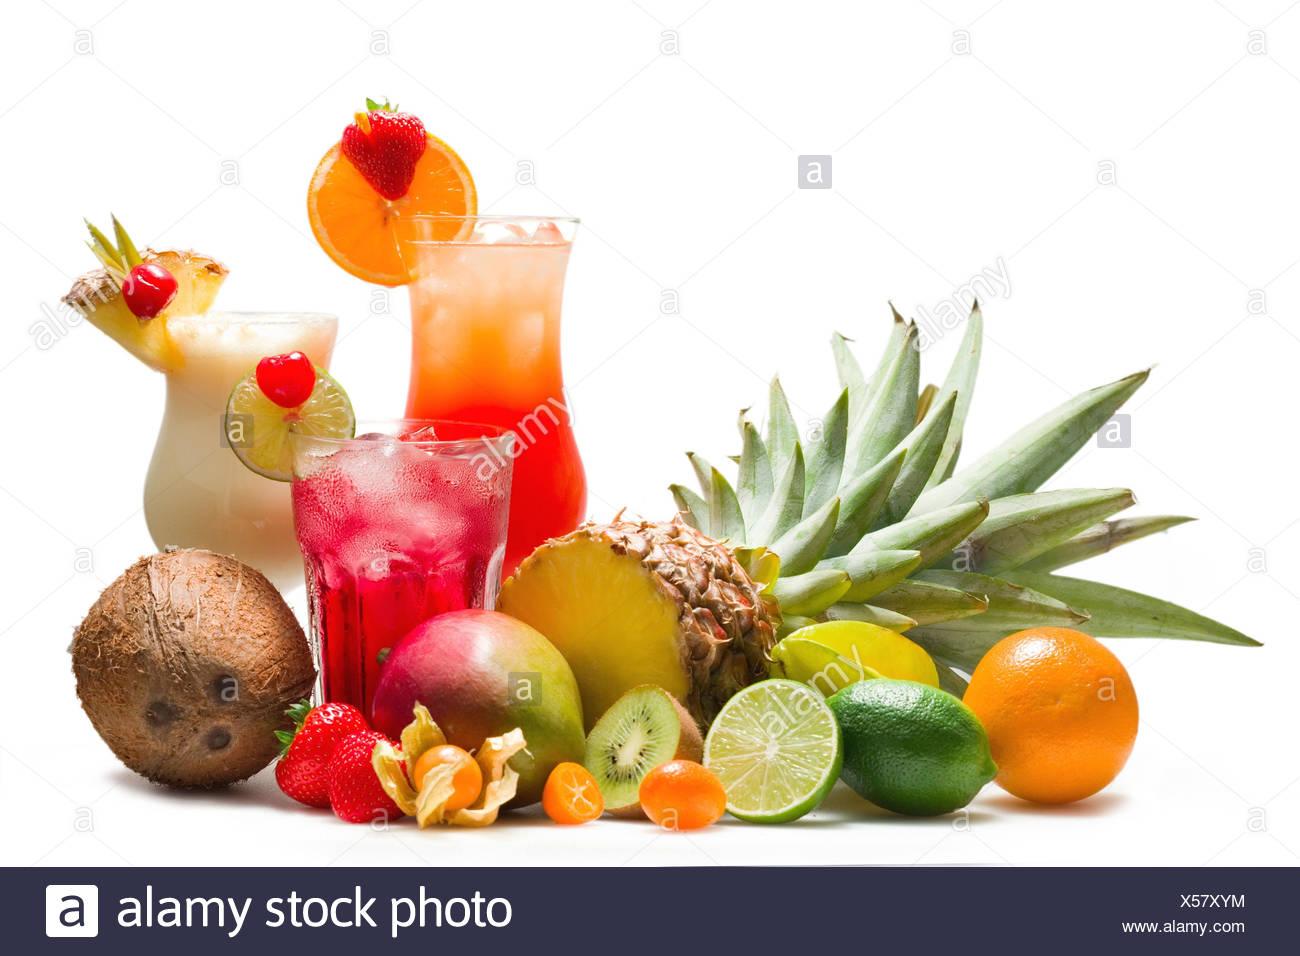 Diferentes cócteles con frutas tropicales, Imagen De Stock